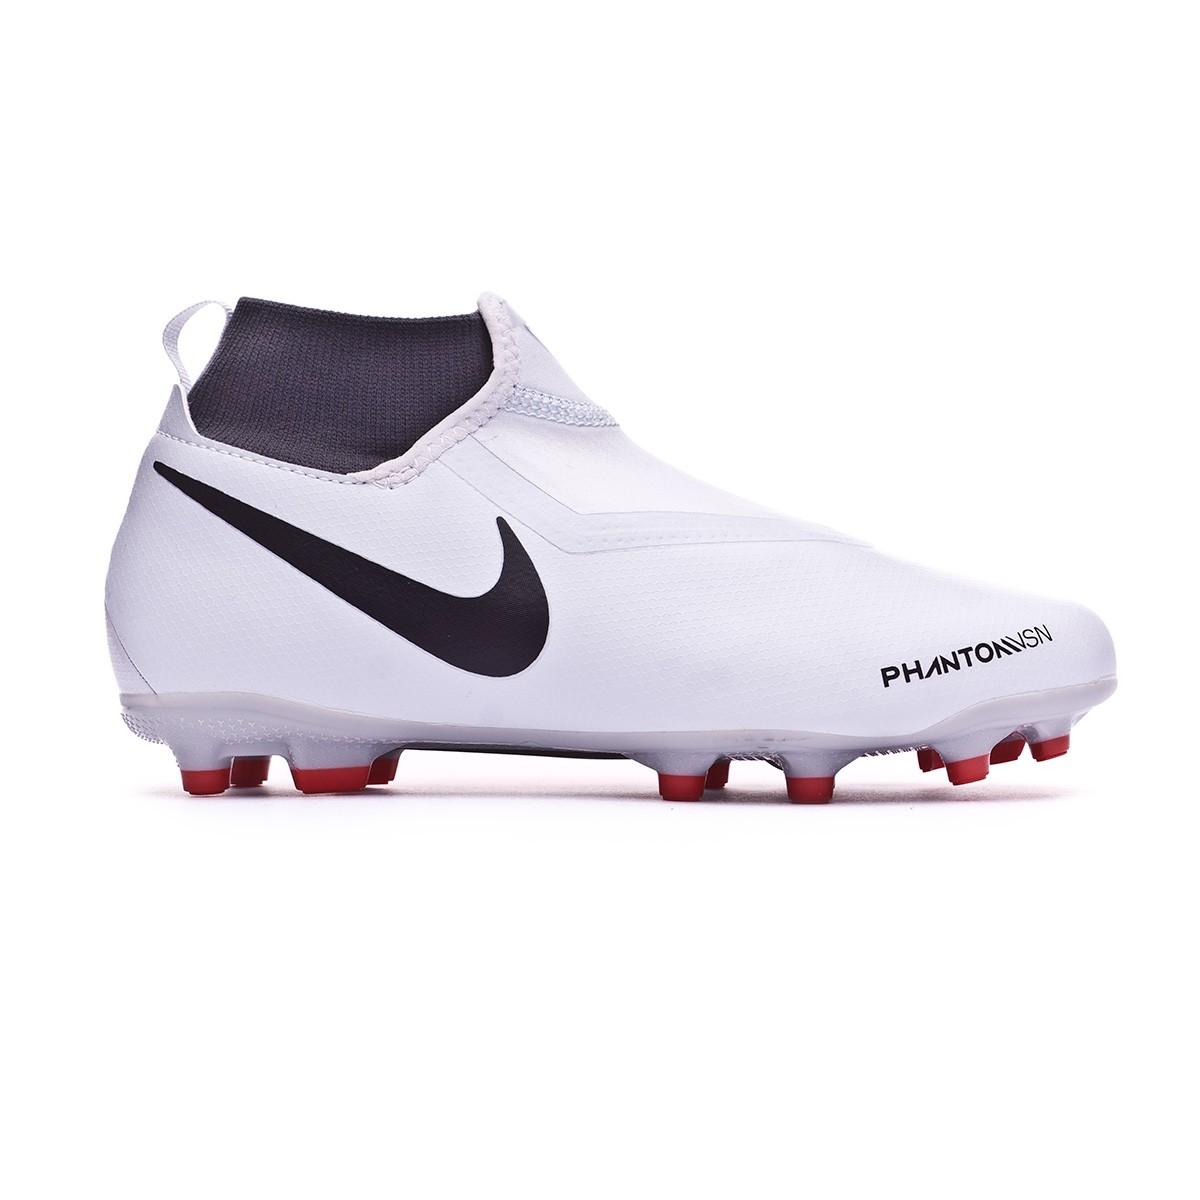 34cb306db Football Boots Nike Kids Phantom Vision Academy DF MG Pure platinum-Black-Light  crimson-Dark grey - Tienda de fútbol Fútbol Emotion